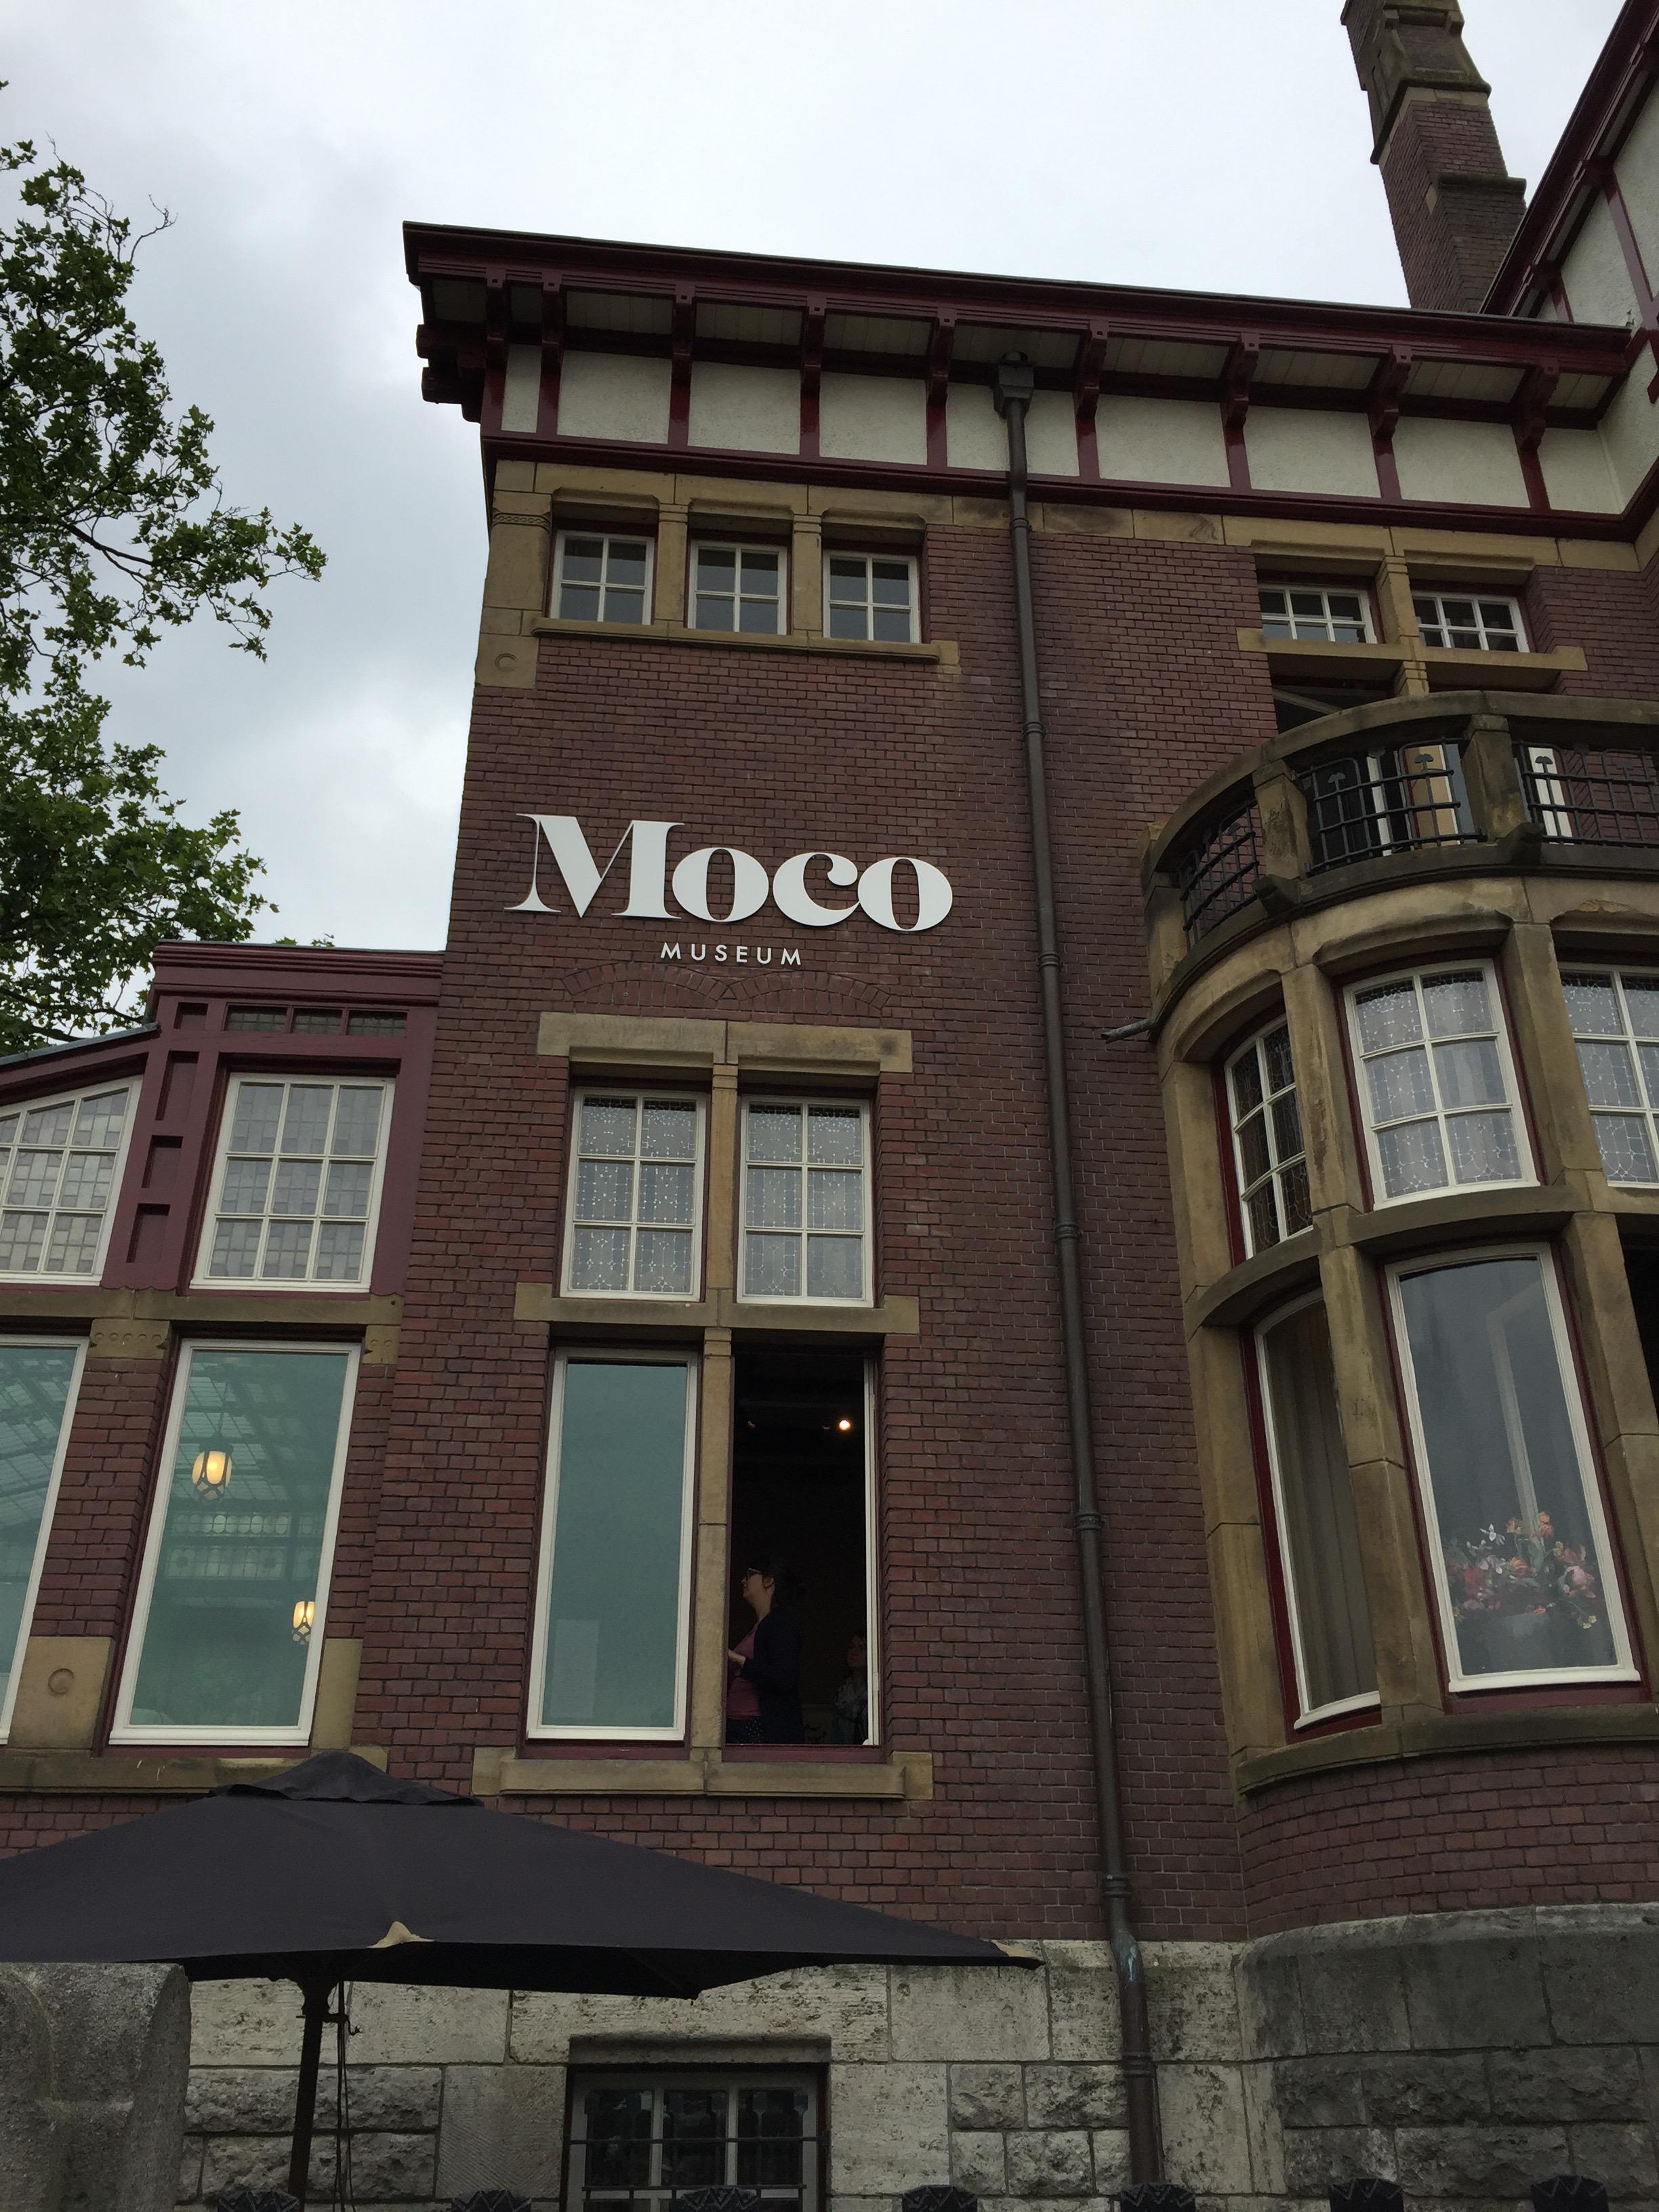 Moco Museum building in Amsterdam